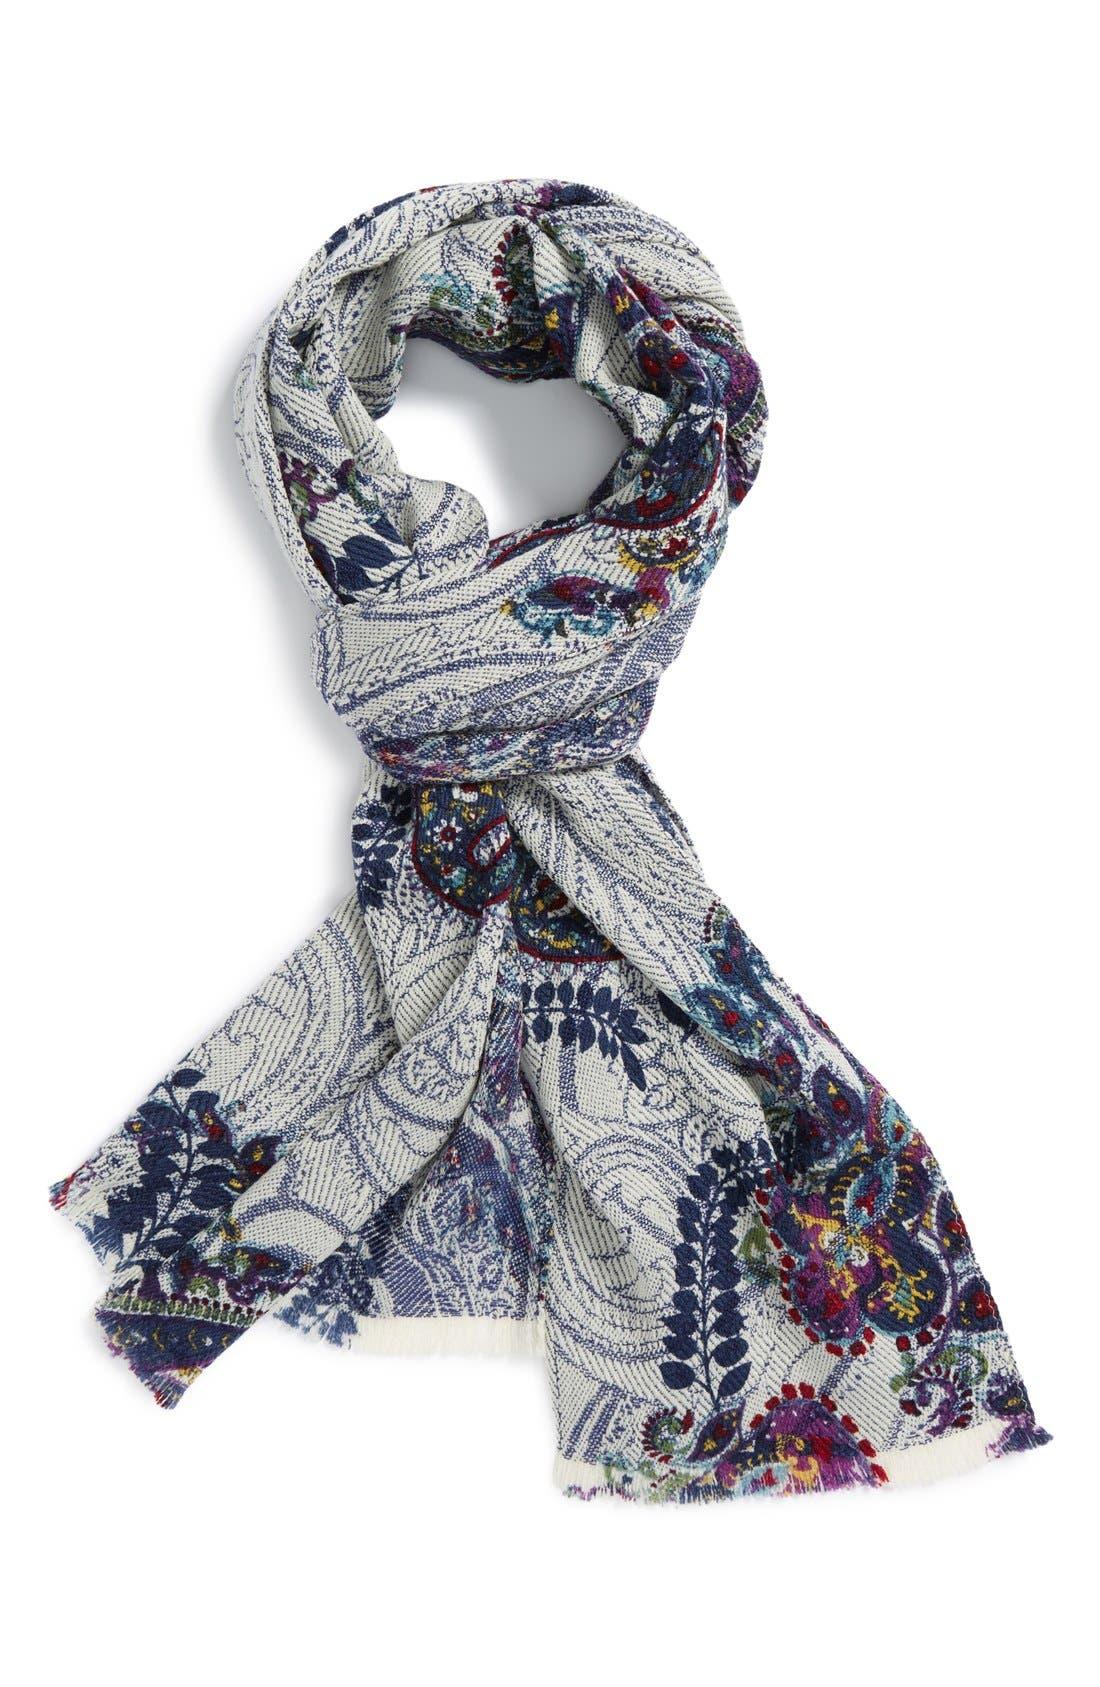 Alternate Image 1 Selected - Etro Print Wool Knit Scarf